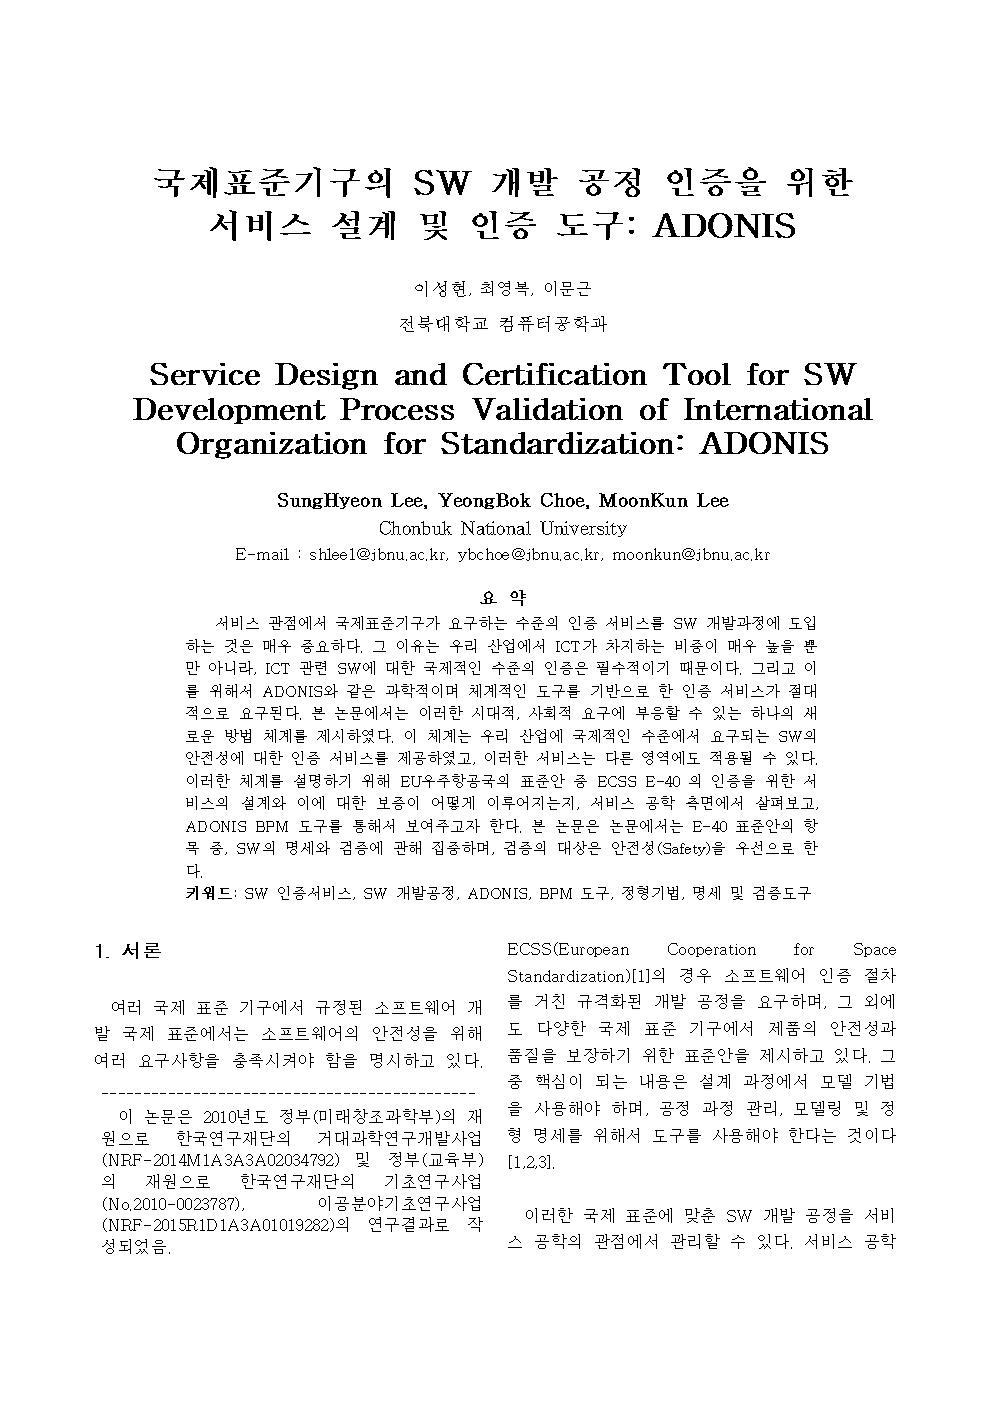 Service Science Paper ADONIS001.jpg